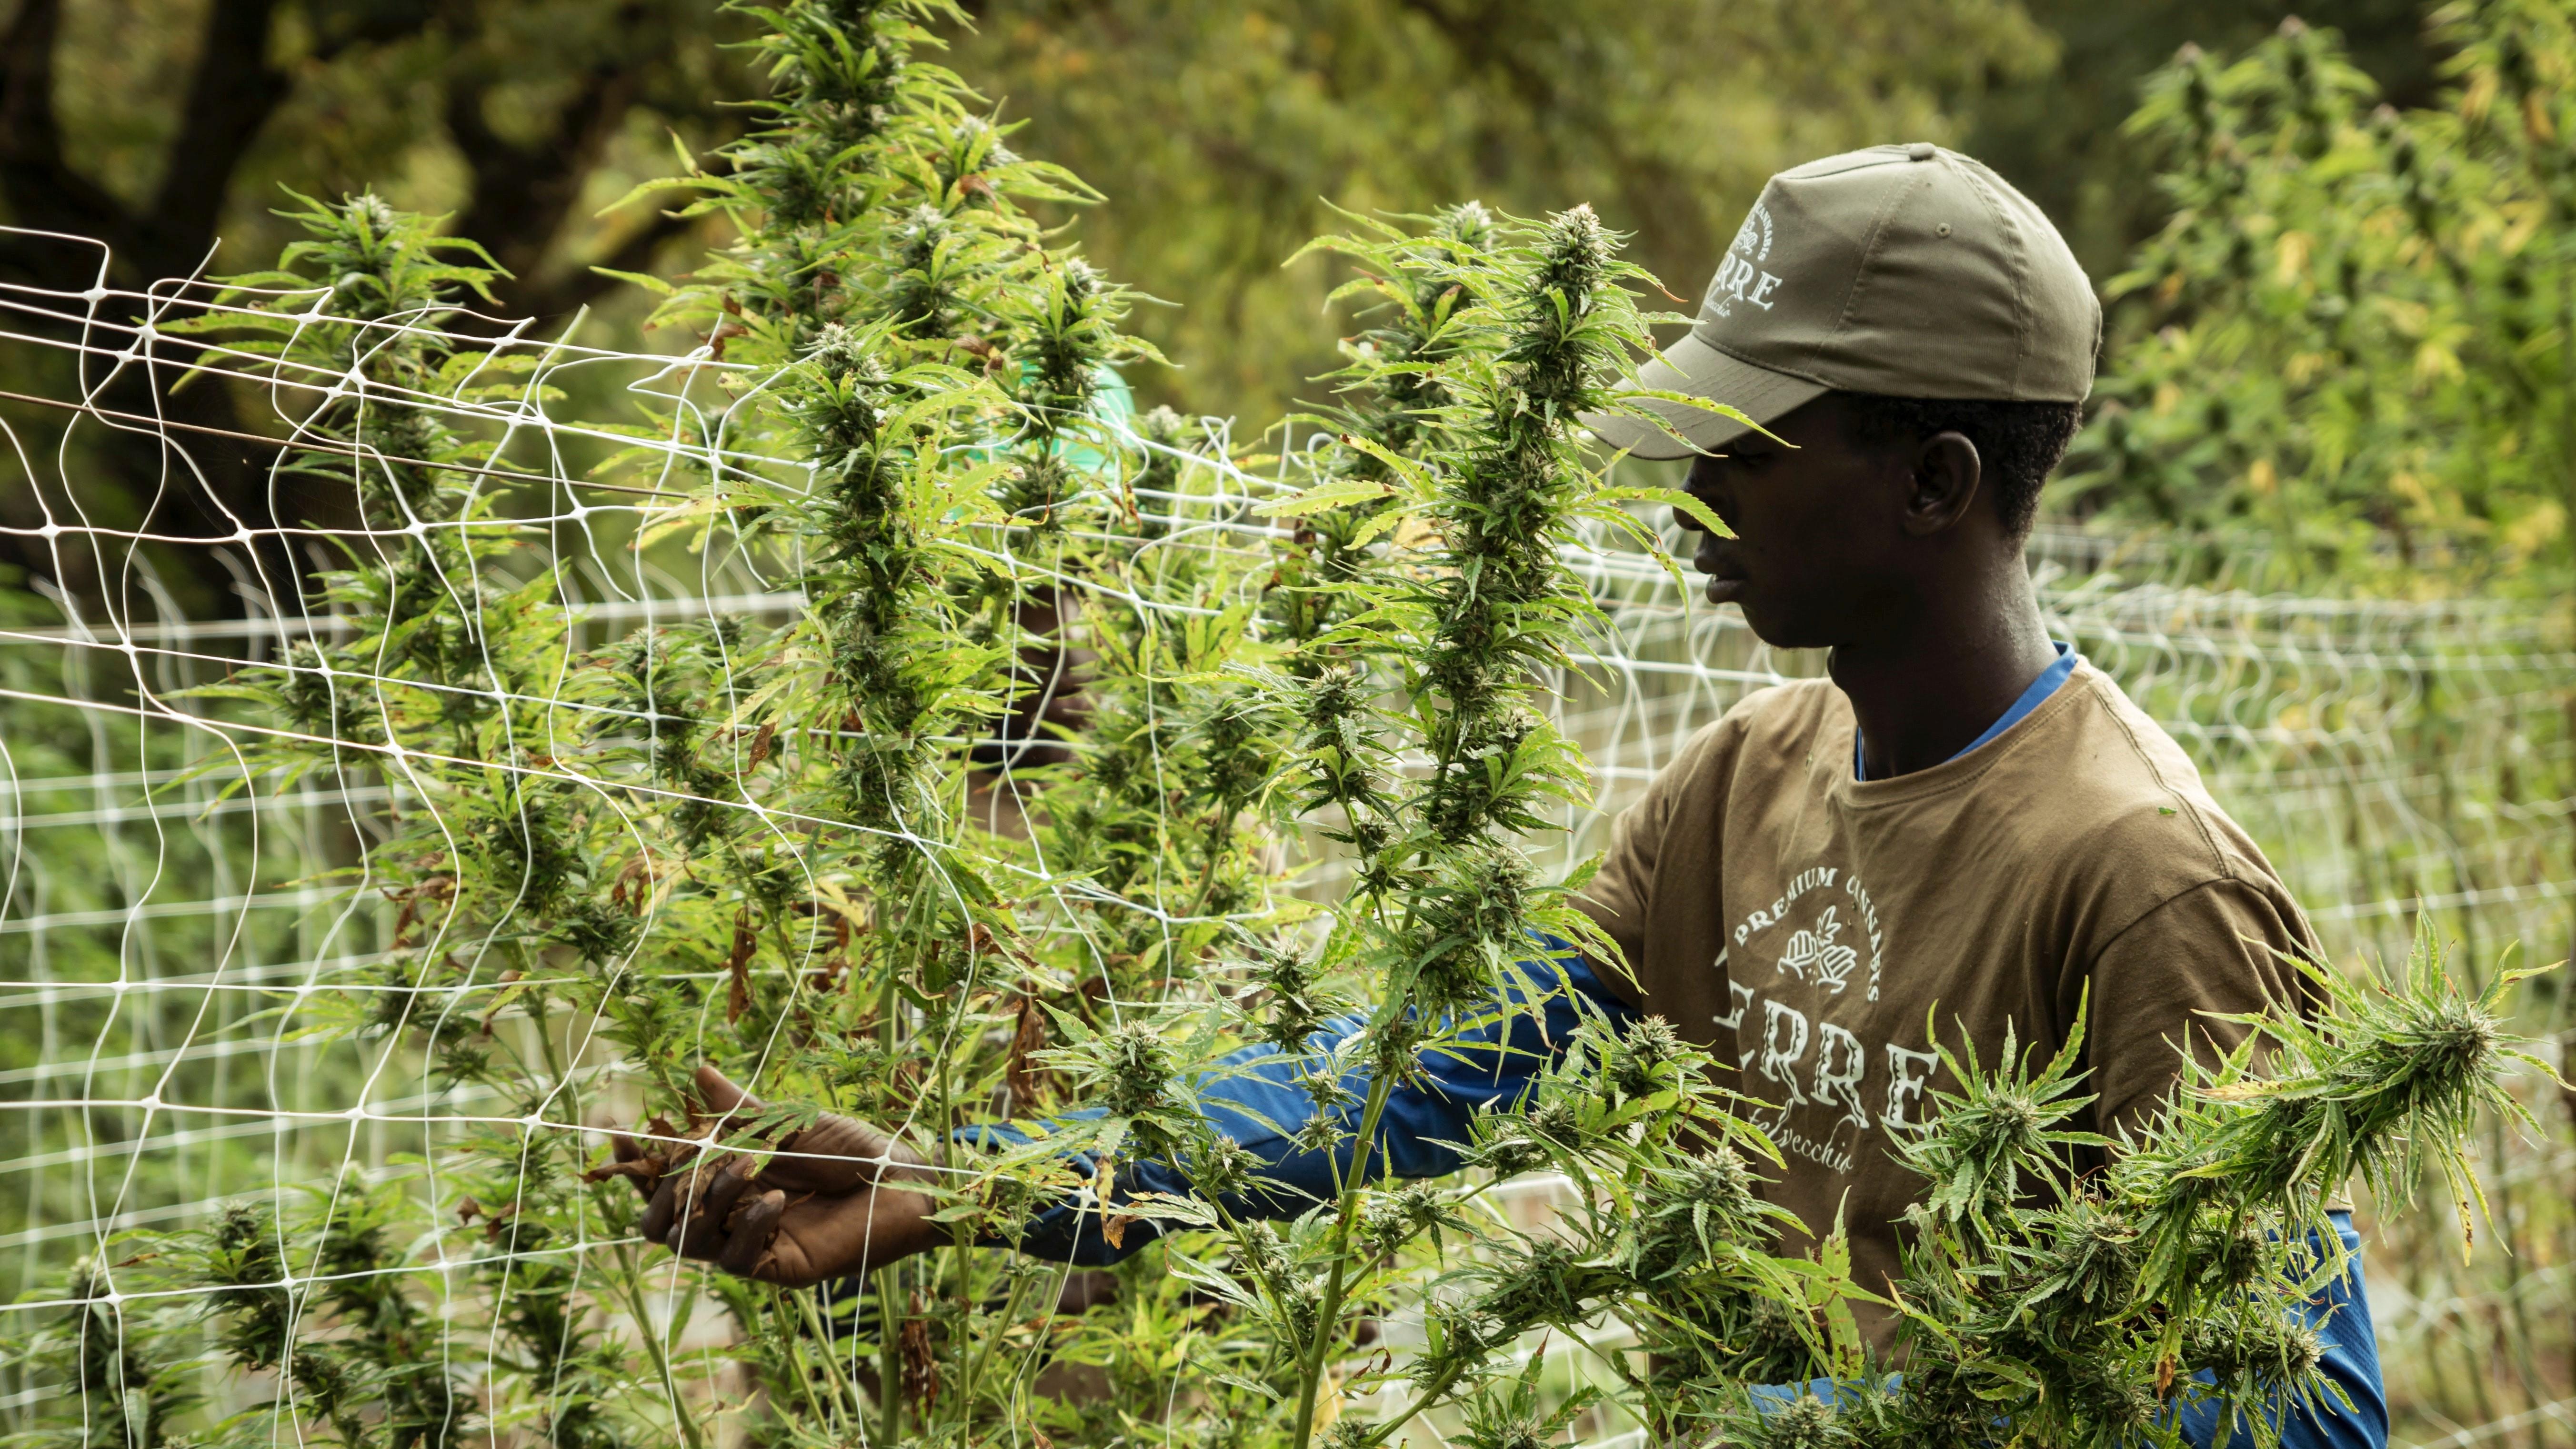 Industry News - Cannabis Jobs in High Demand